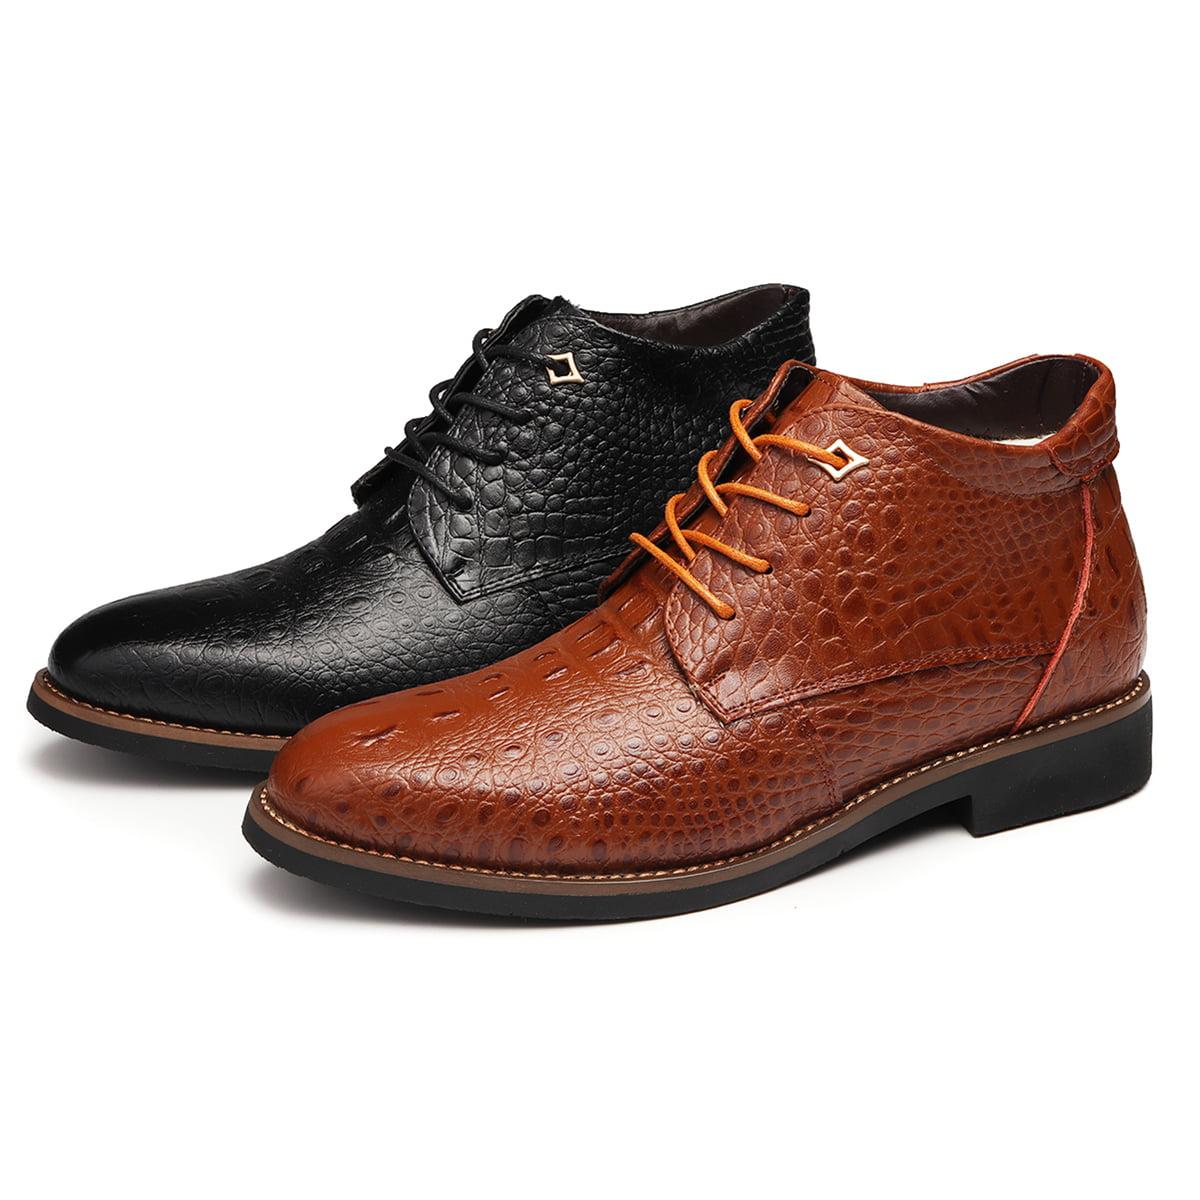 4cb413155 YJP - YJP Fur Winter Warm Men Formal Shoes Snow Boots Leather Waterproof  Rain Snow Flats - Walmart.com